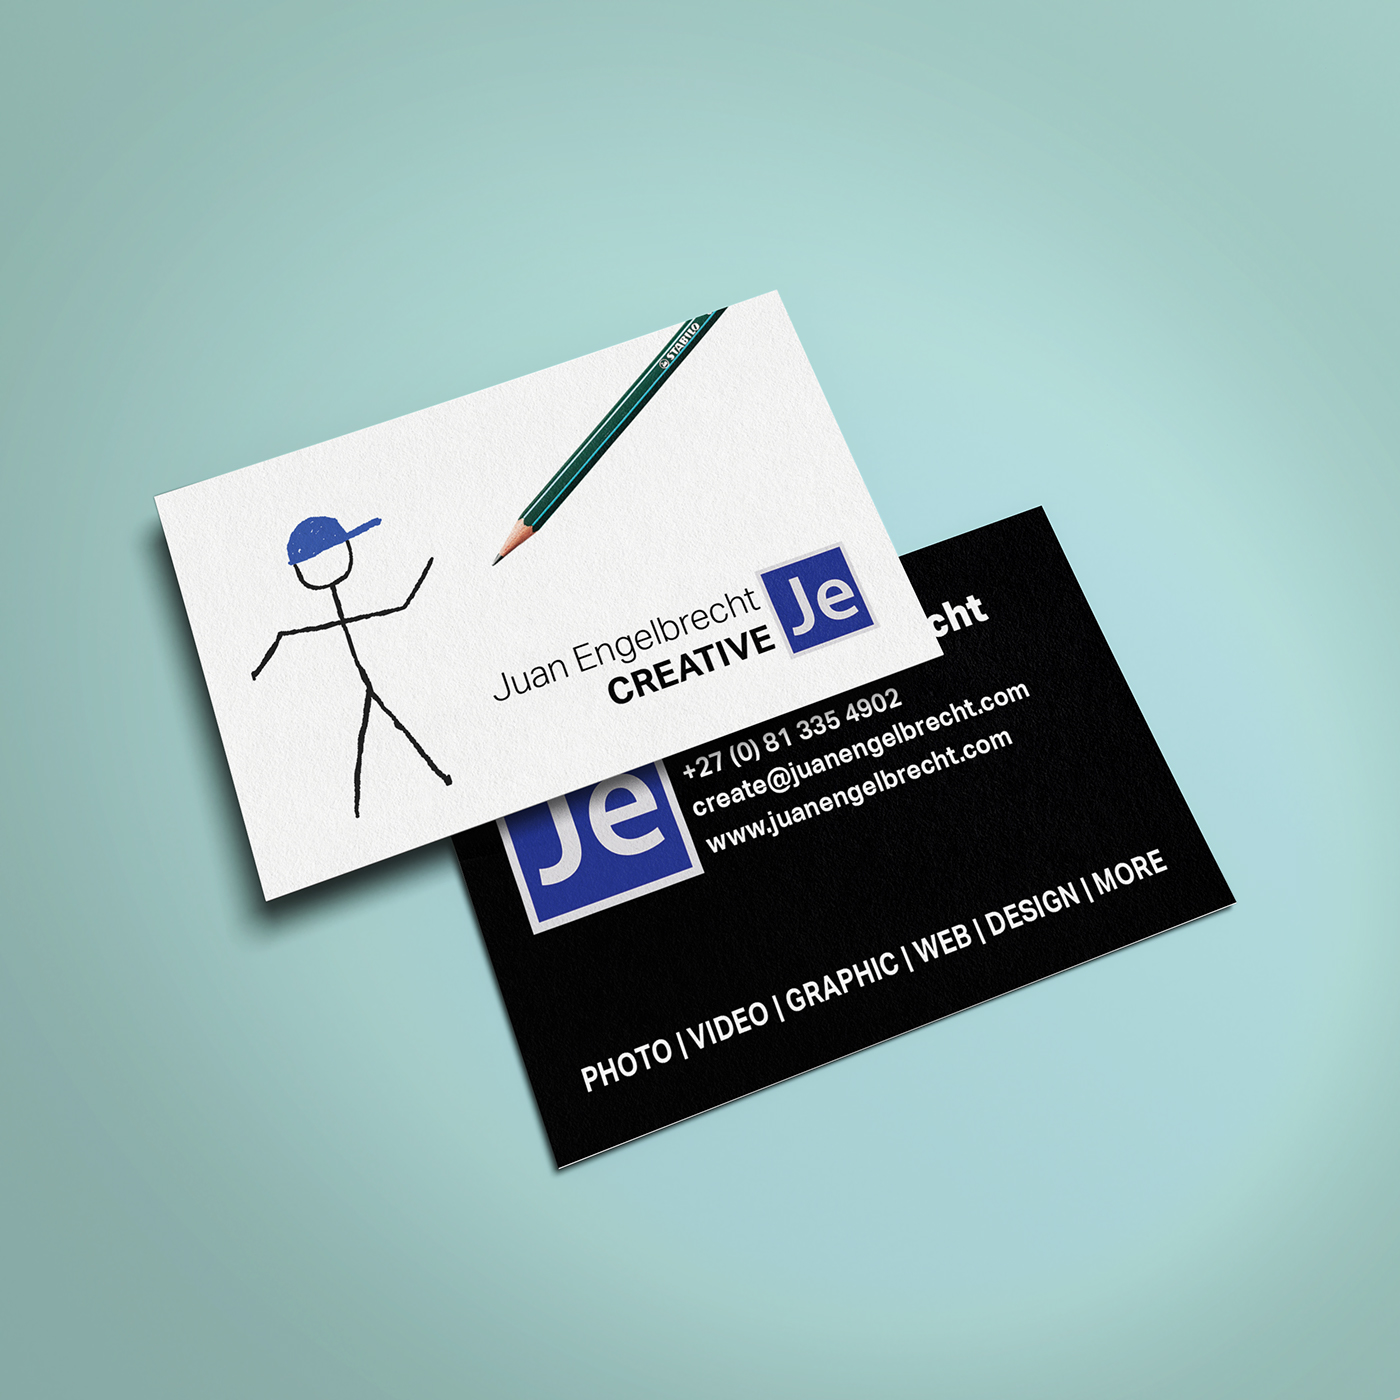 Juan engelbrecht creative business card design on behance thank you reheart Image collections